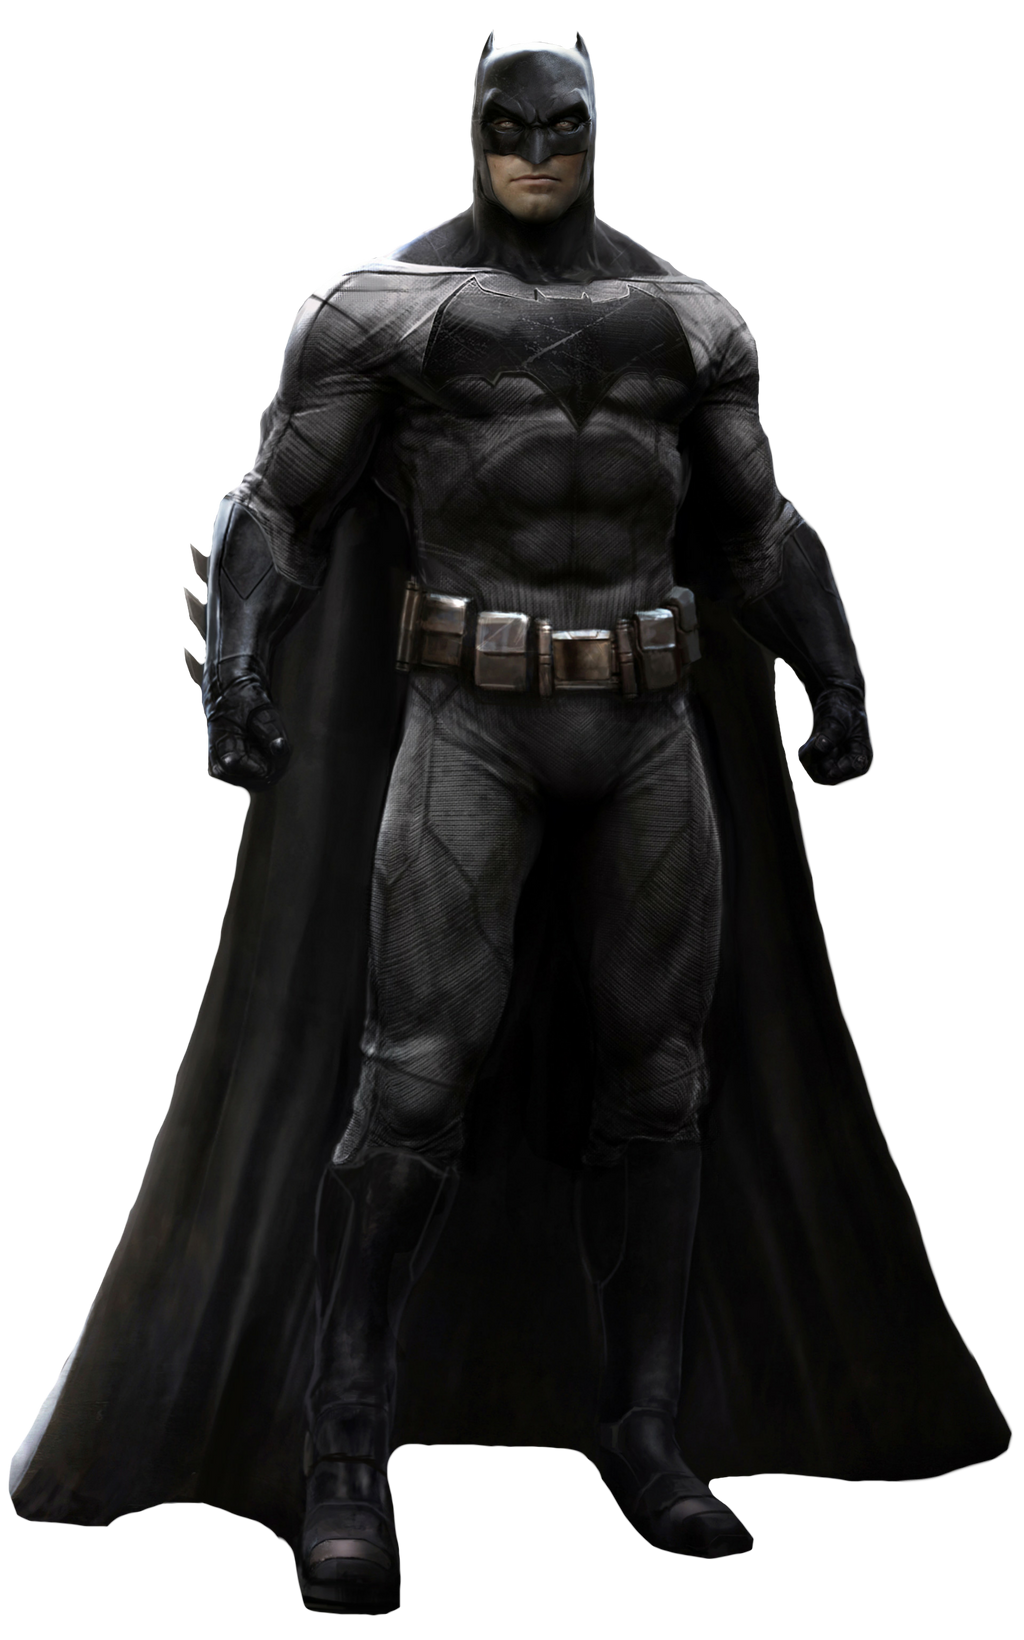 Batman - Transparent by Asthonx1 on DeviantArt